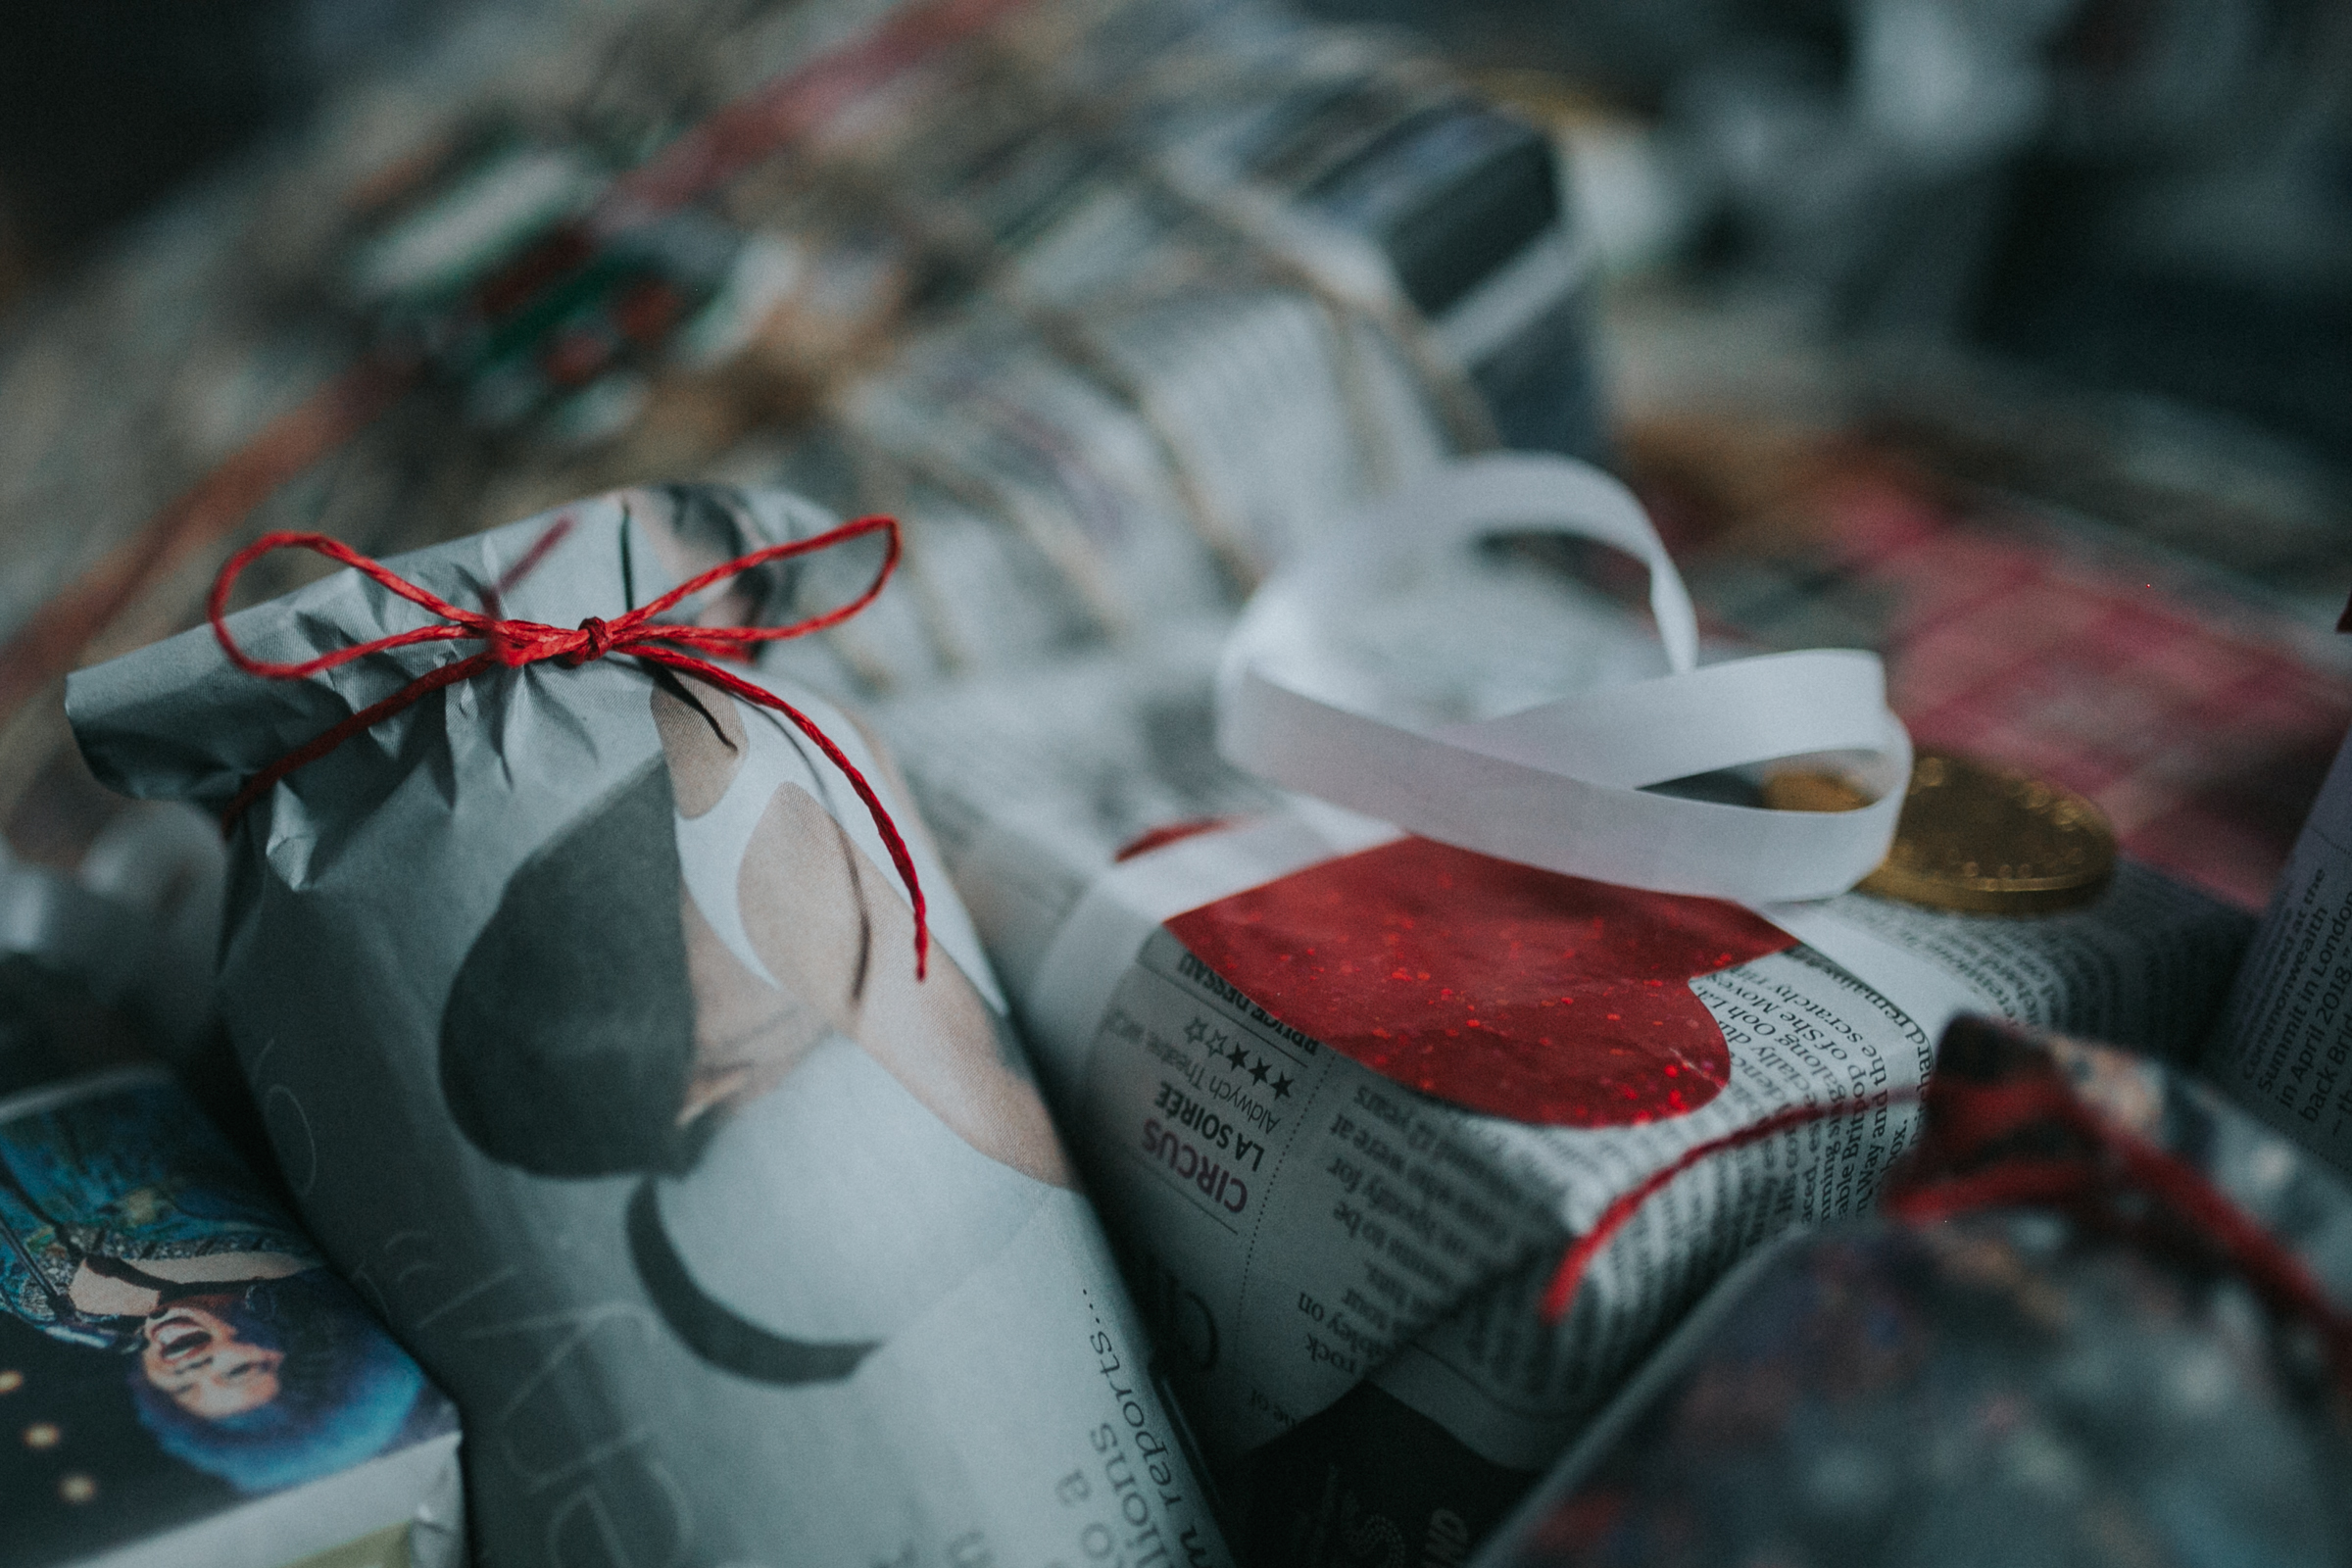 Christmas-gift-wrapping-ideas-minas-planet-minasplanet-how-to-wrap-christmas-presents-diy13.jpg